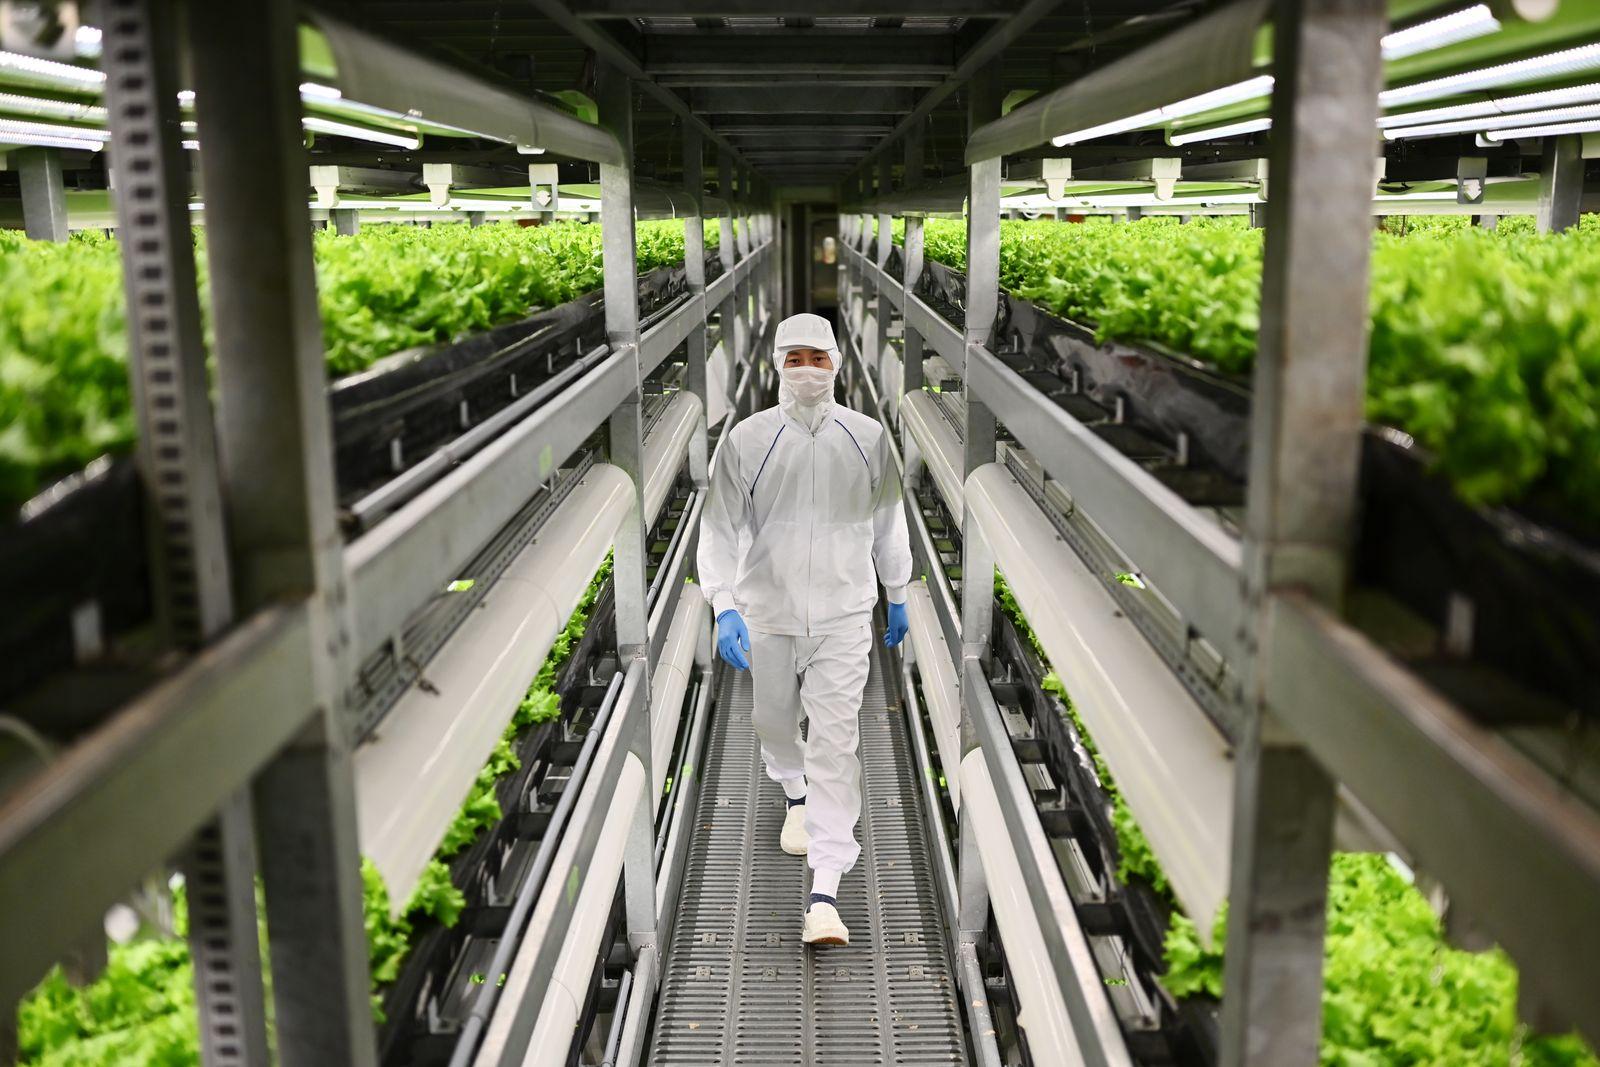 DOUNIAMAG-JAPAN-FARMING-AGRICULTURE-AGRONOMY